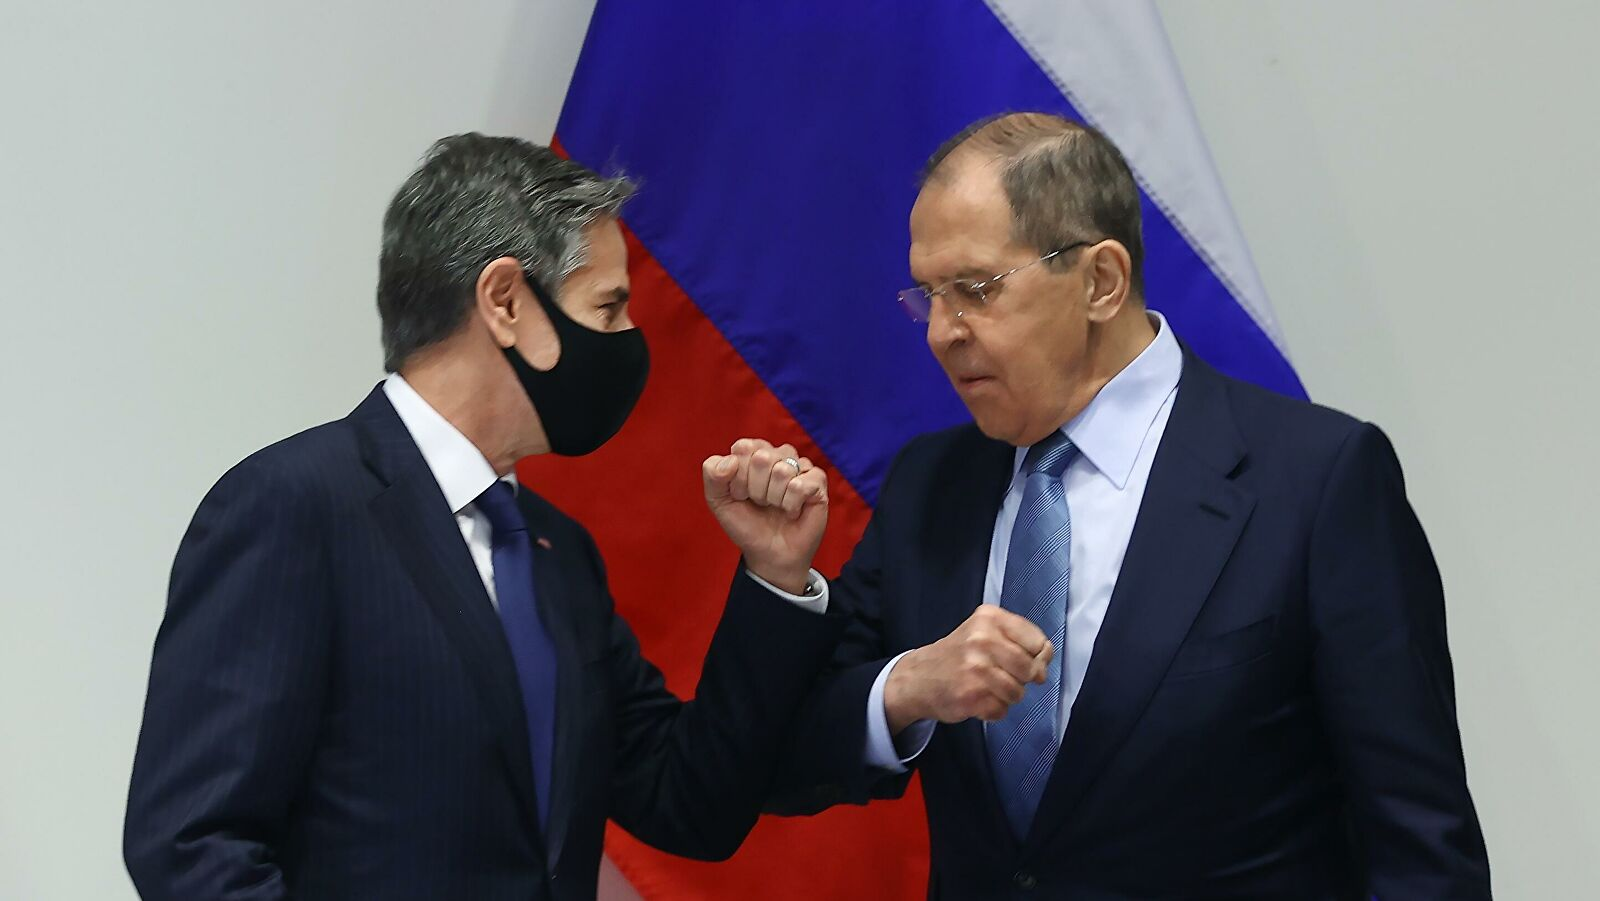 Blinken says meeting with Lavrov in Reykjavik constructive